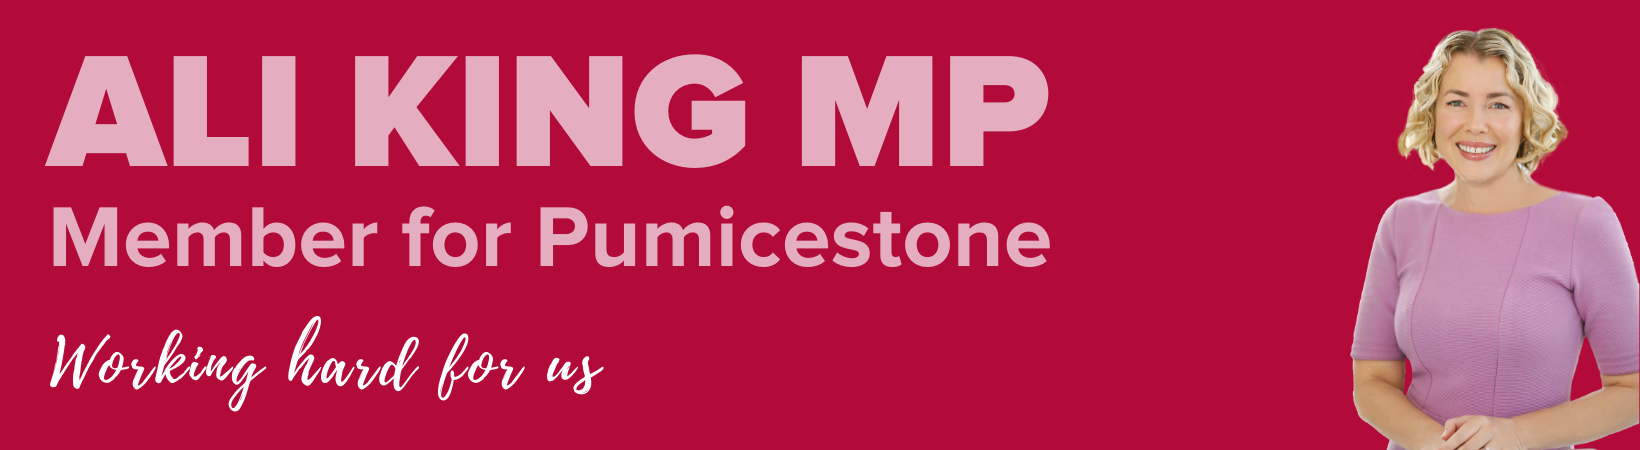 Ali King Member for Pumicestone